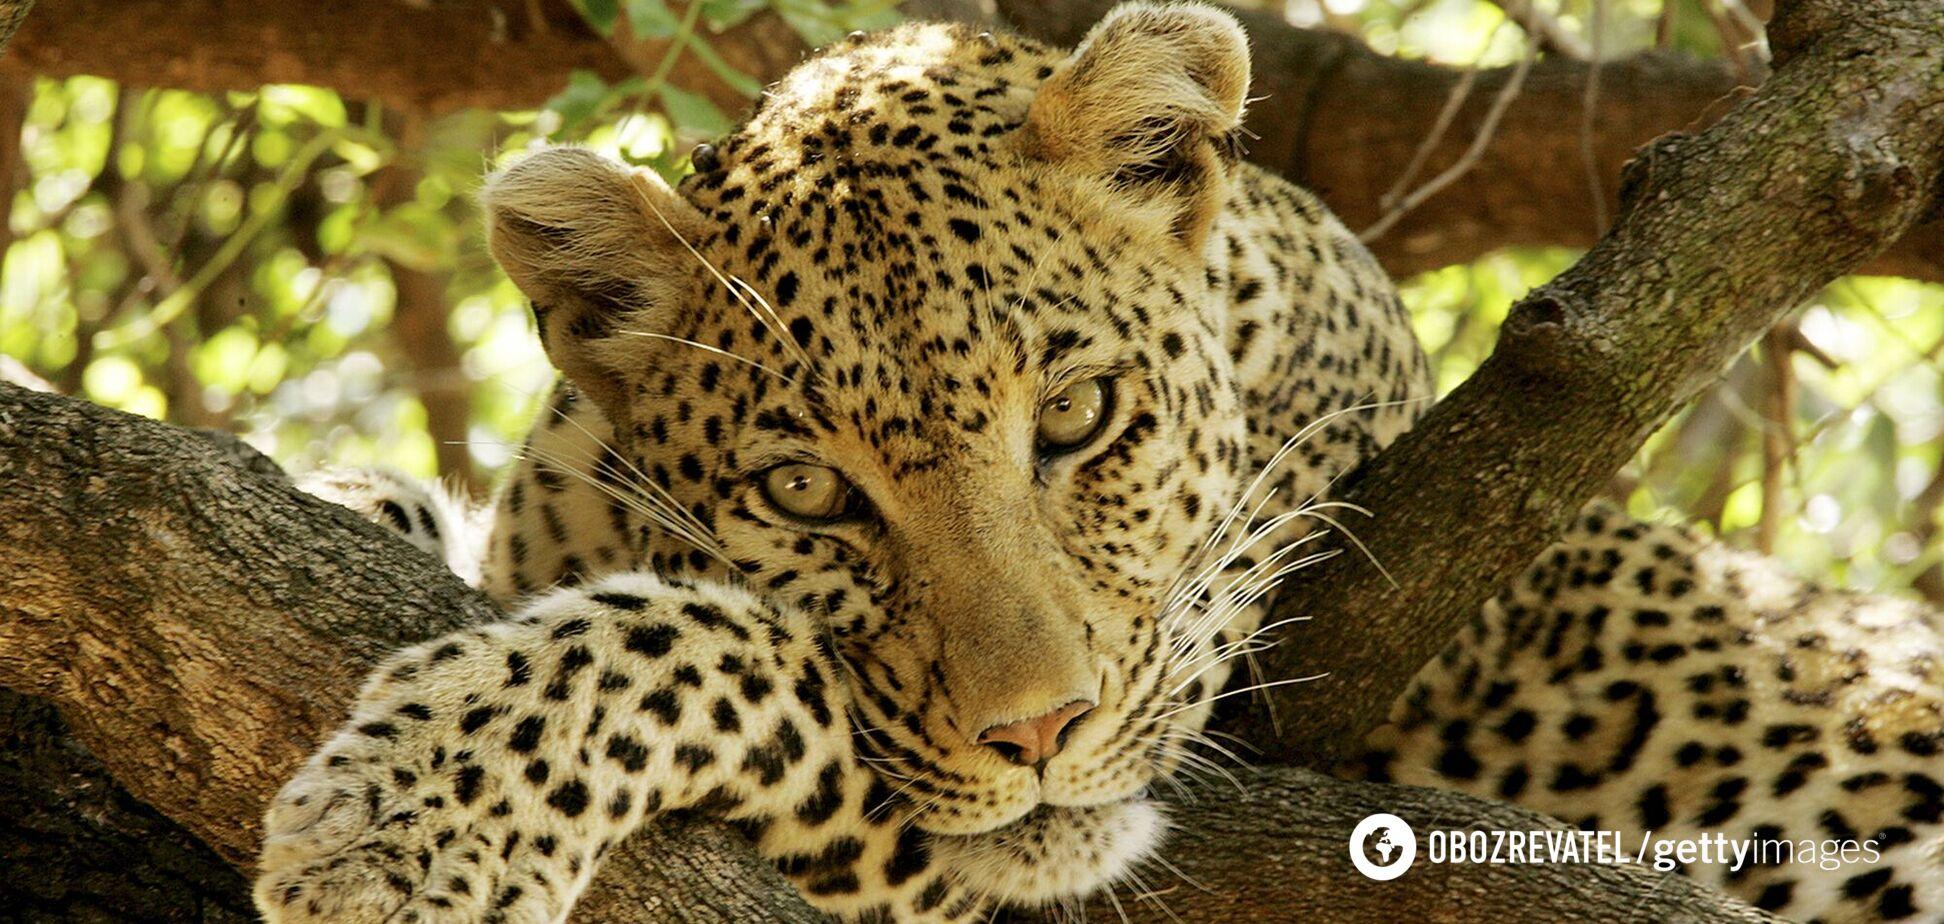 Фотограф запечатлел леопарда, которого невозможно найти на фото